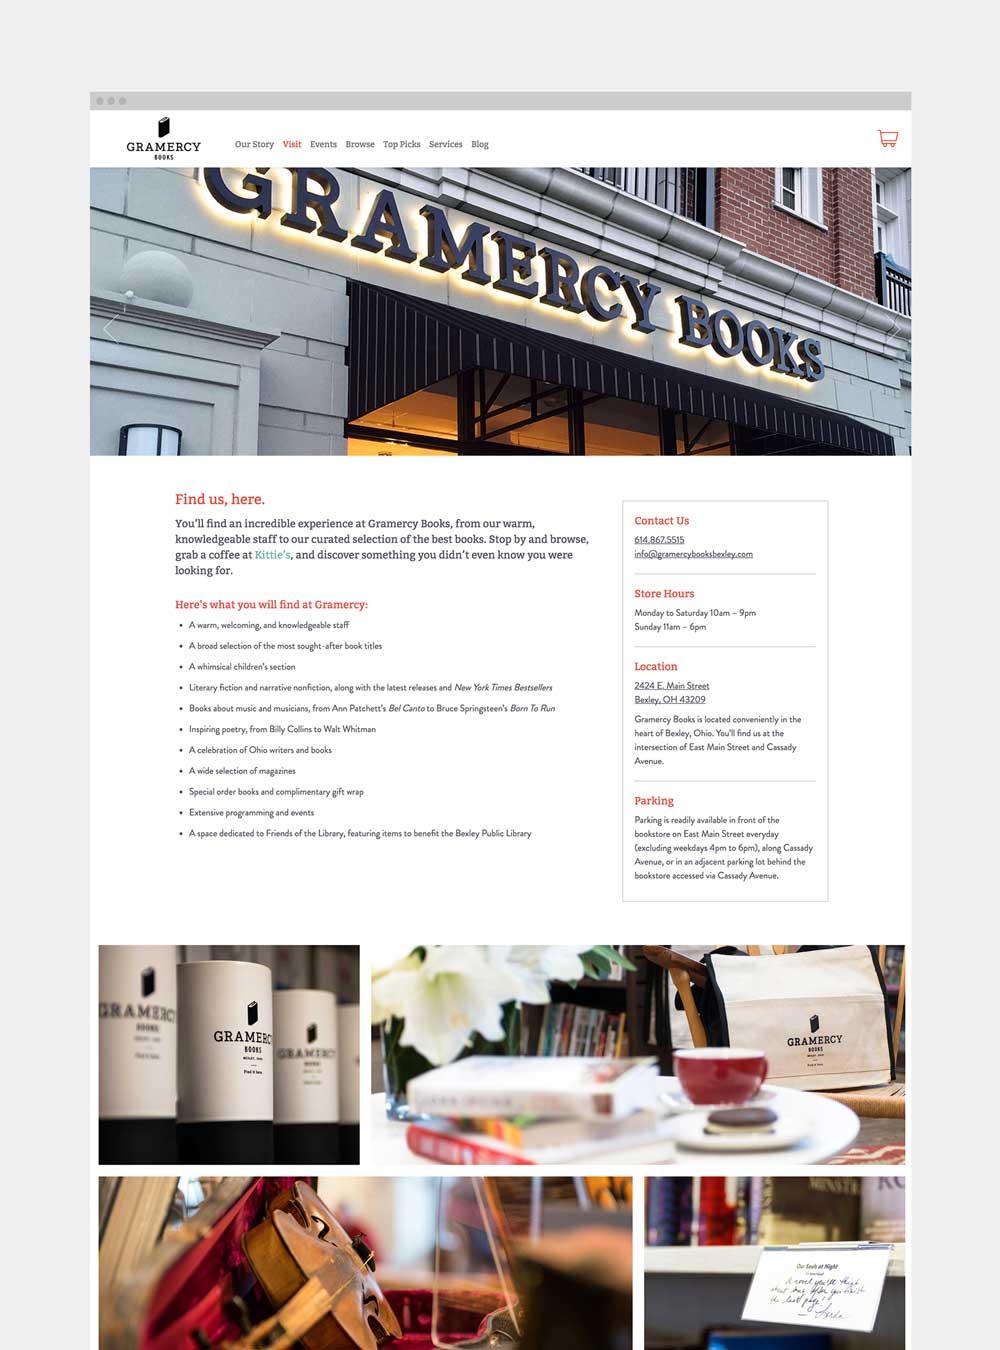 cheers-studios-gramercy-books-bexley-columbus-ohio-website-visit-page-design.jpg